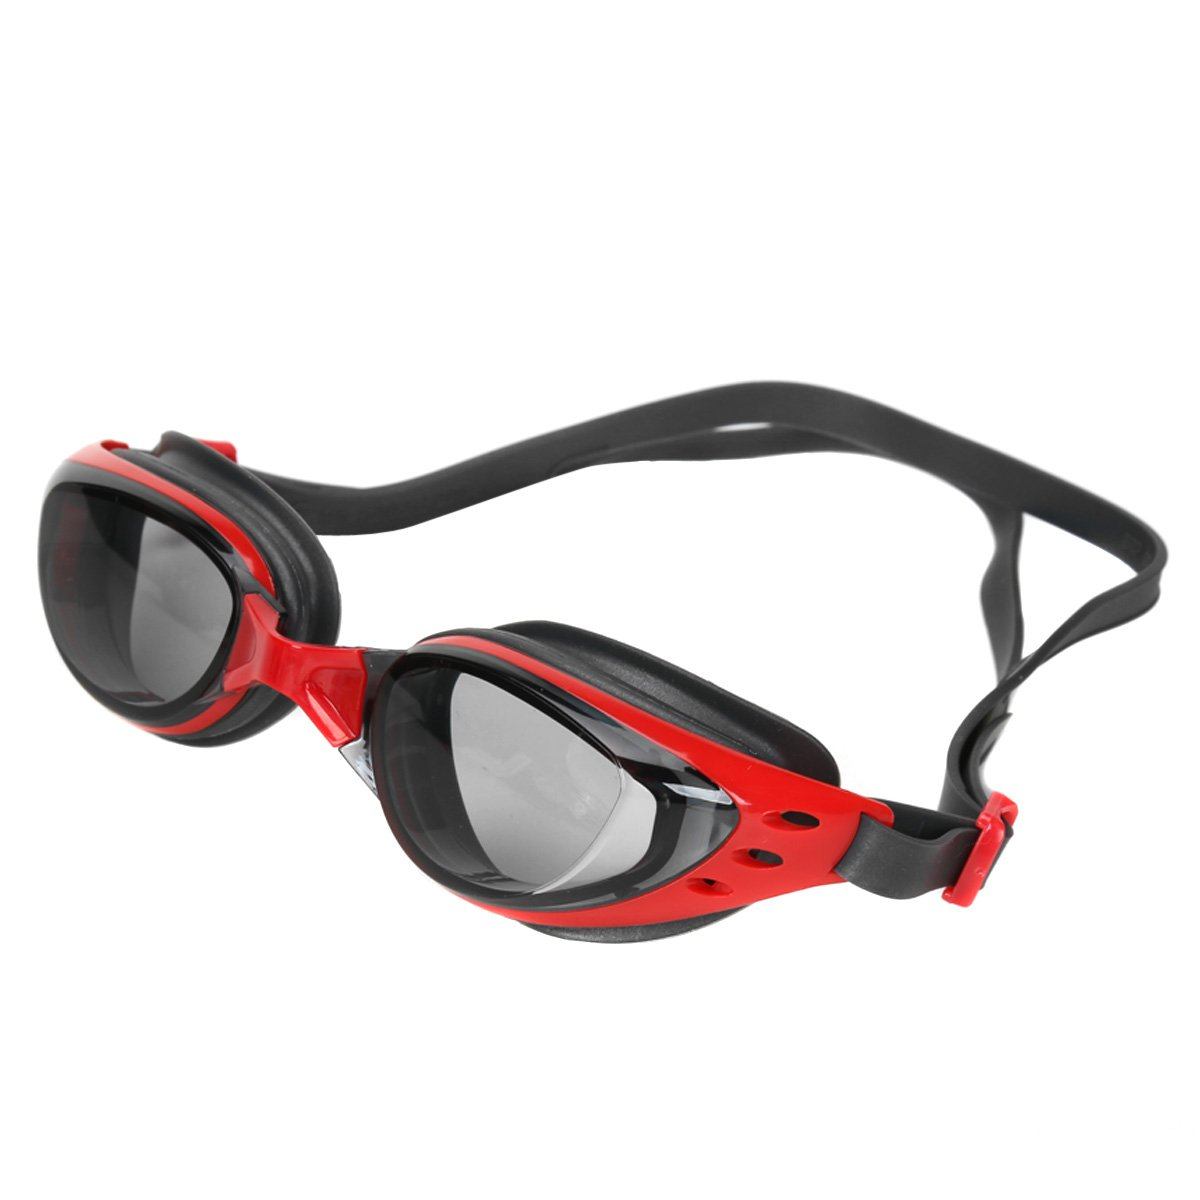 Óculos para Natação Speedo Wynn